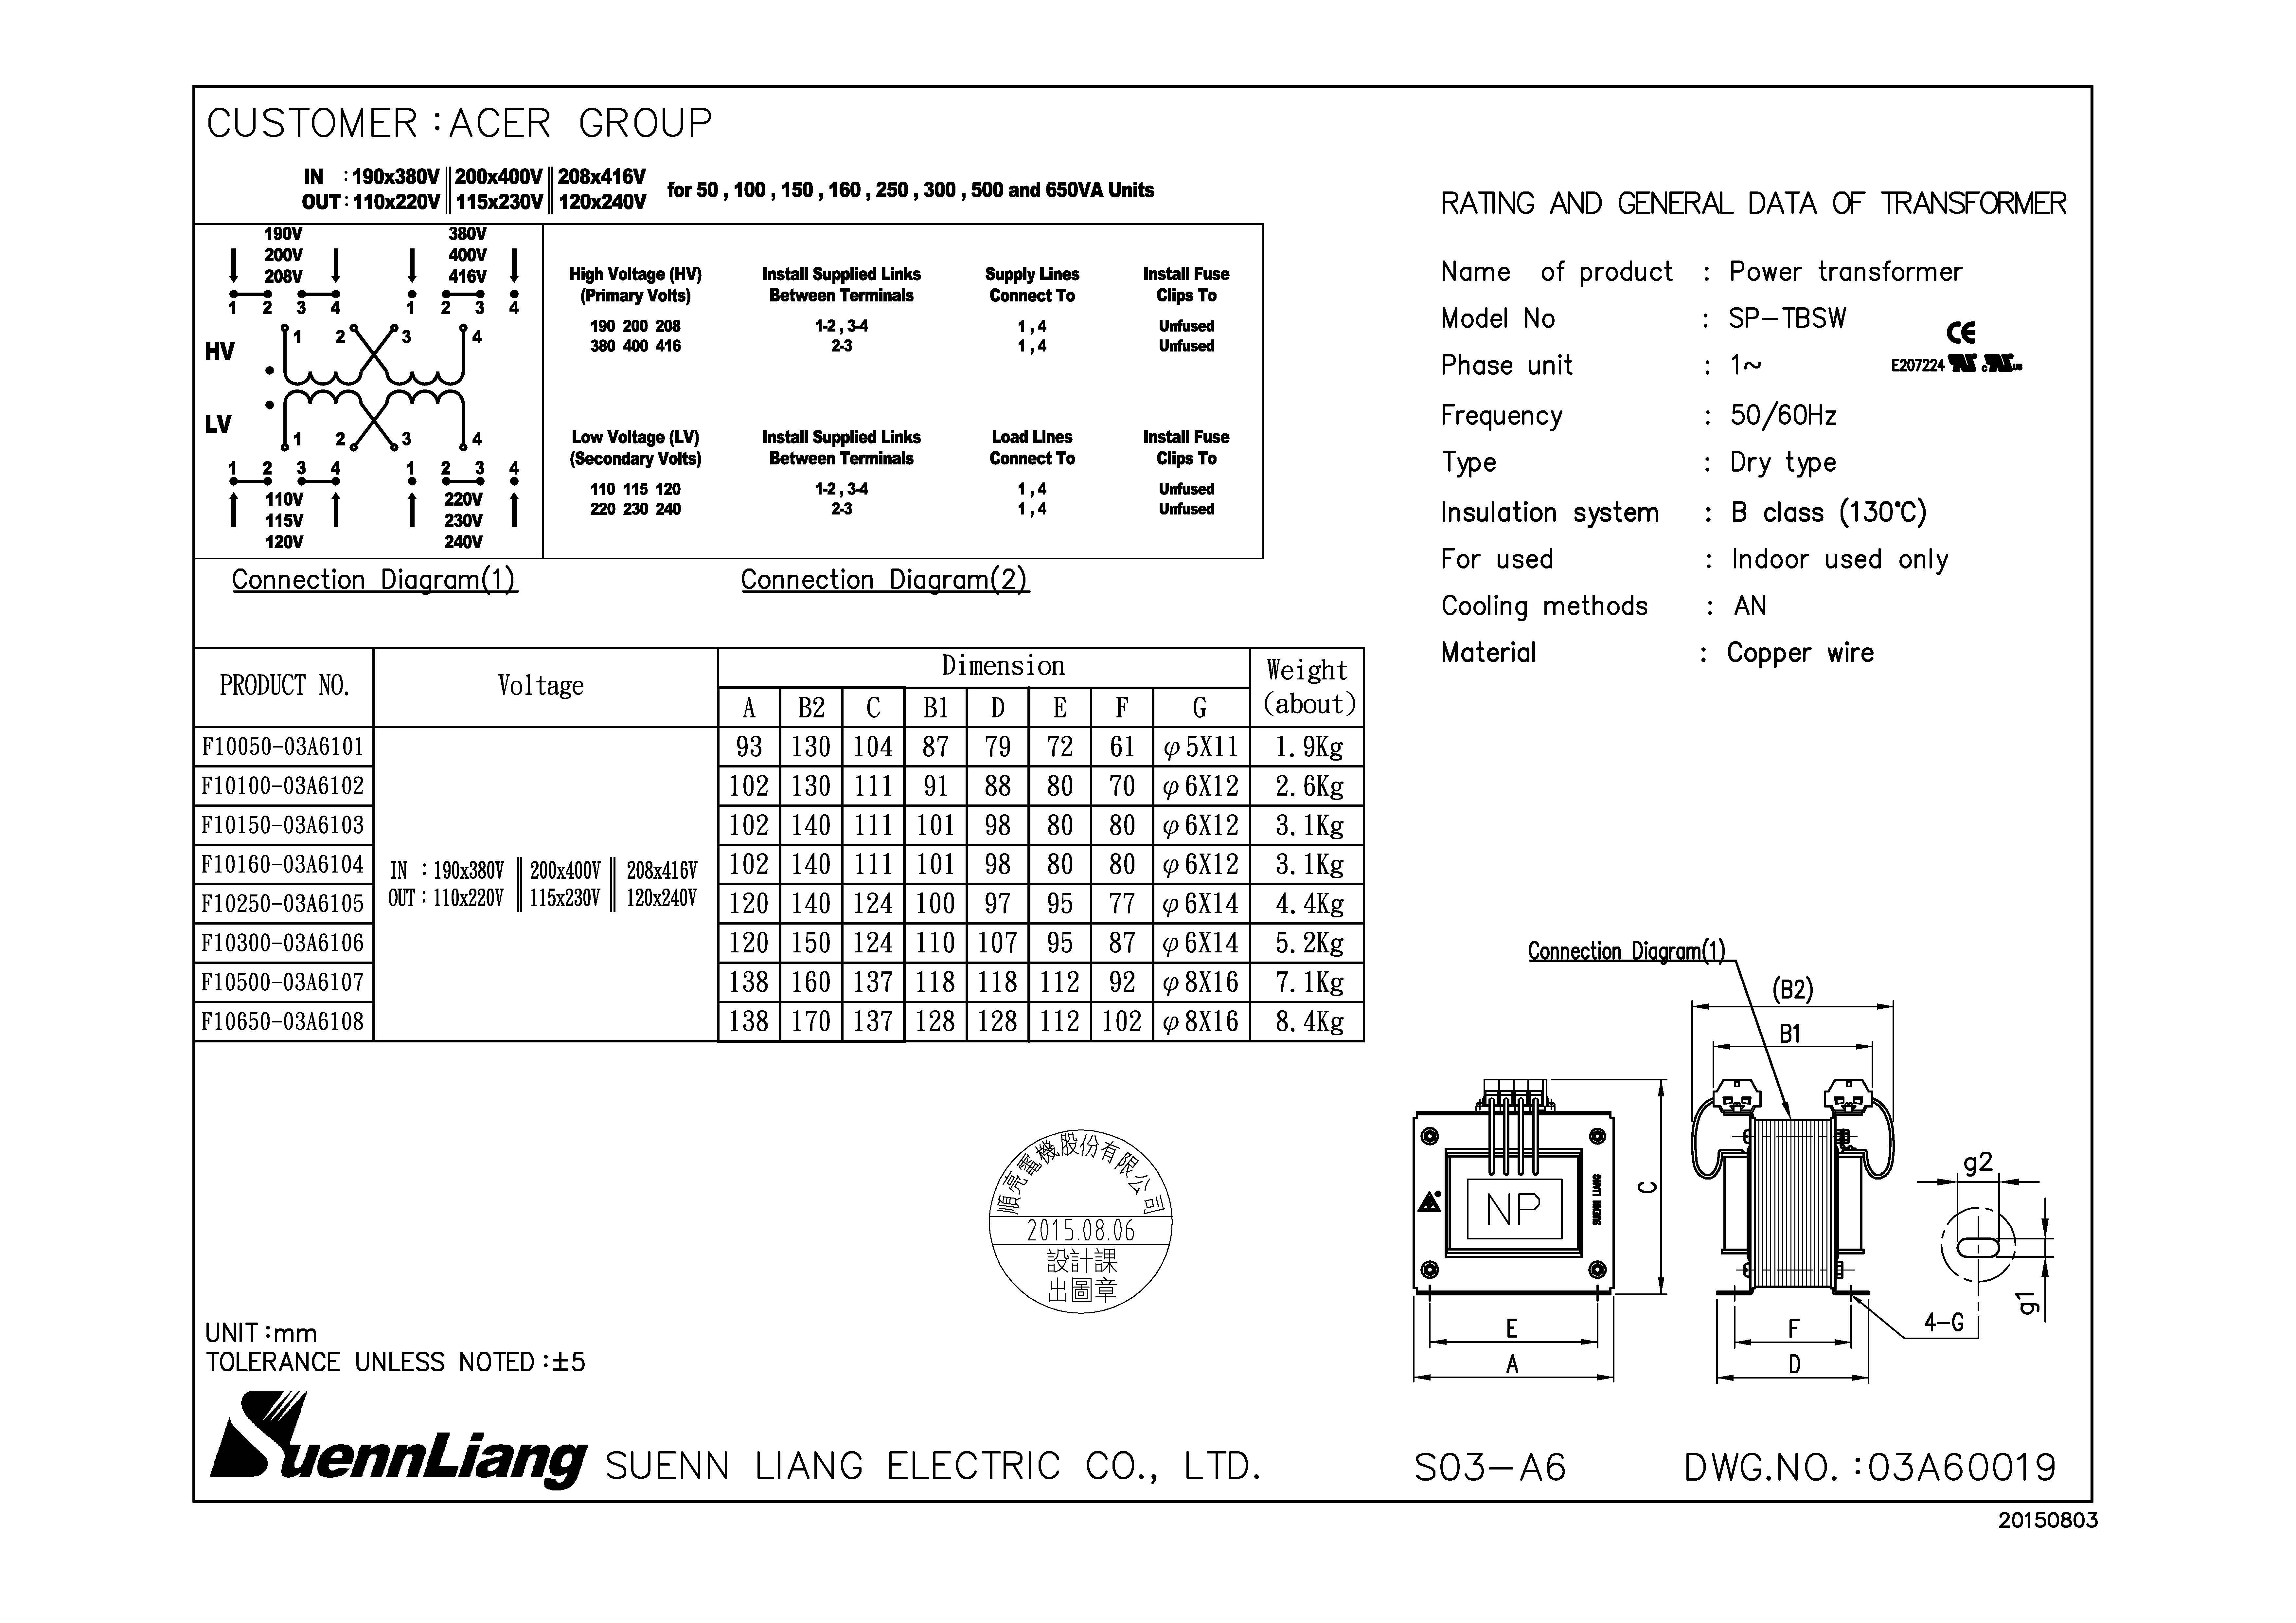 120 240v wiring diagram facbooik com 120 240v Single Phase Transformer Wiring Diagram how to read this 480v single phase transformer wiring diagram 240V 3 Phase Wiring Diagram